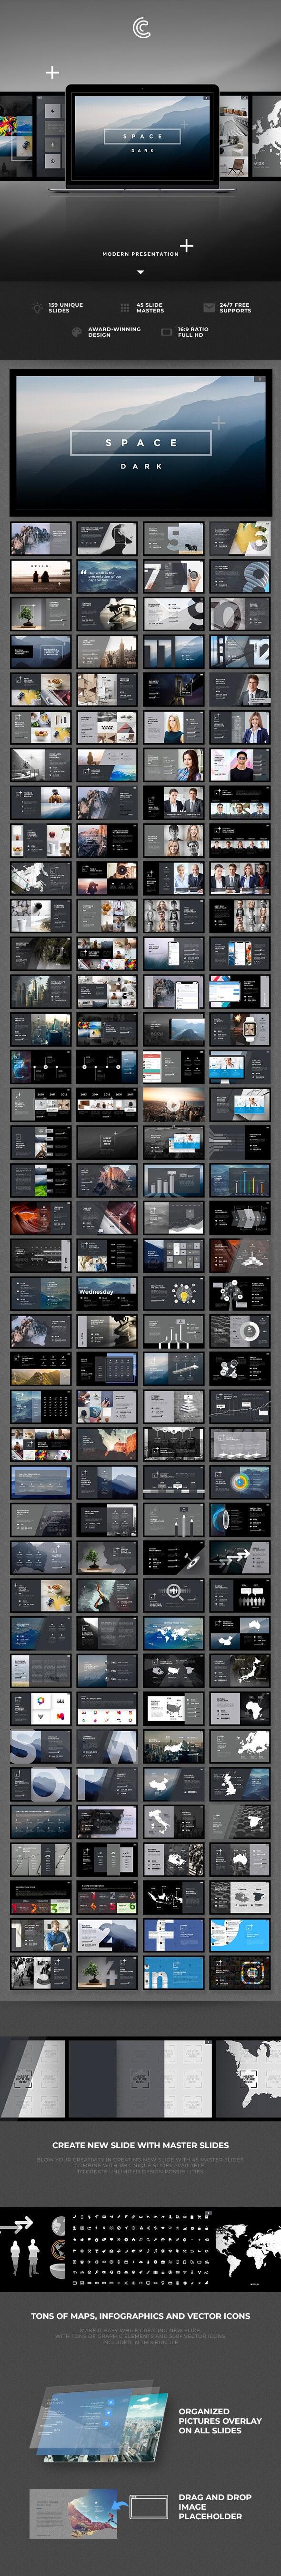 Space Dark PowerPoint - PowerPoint Templates Presentation Templates